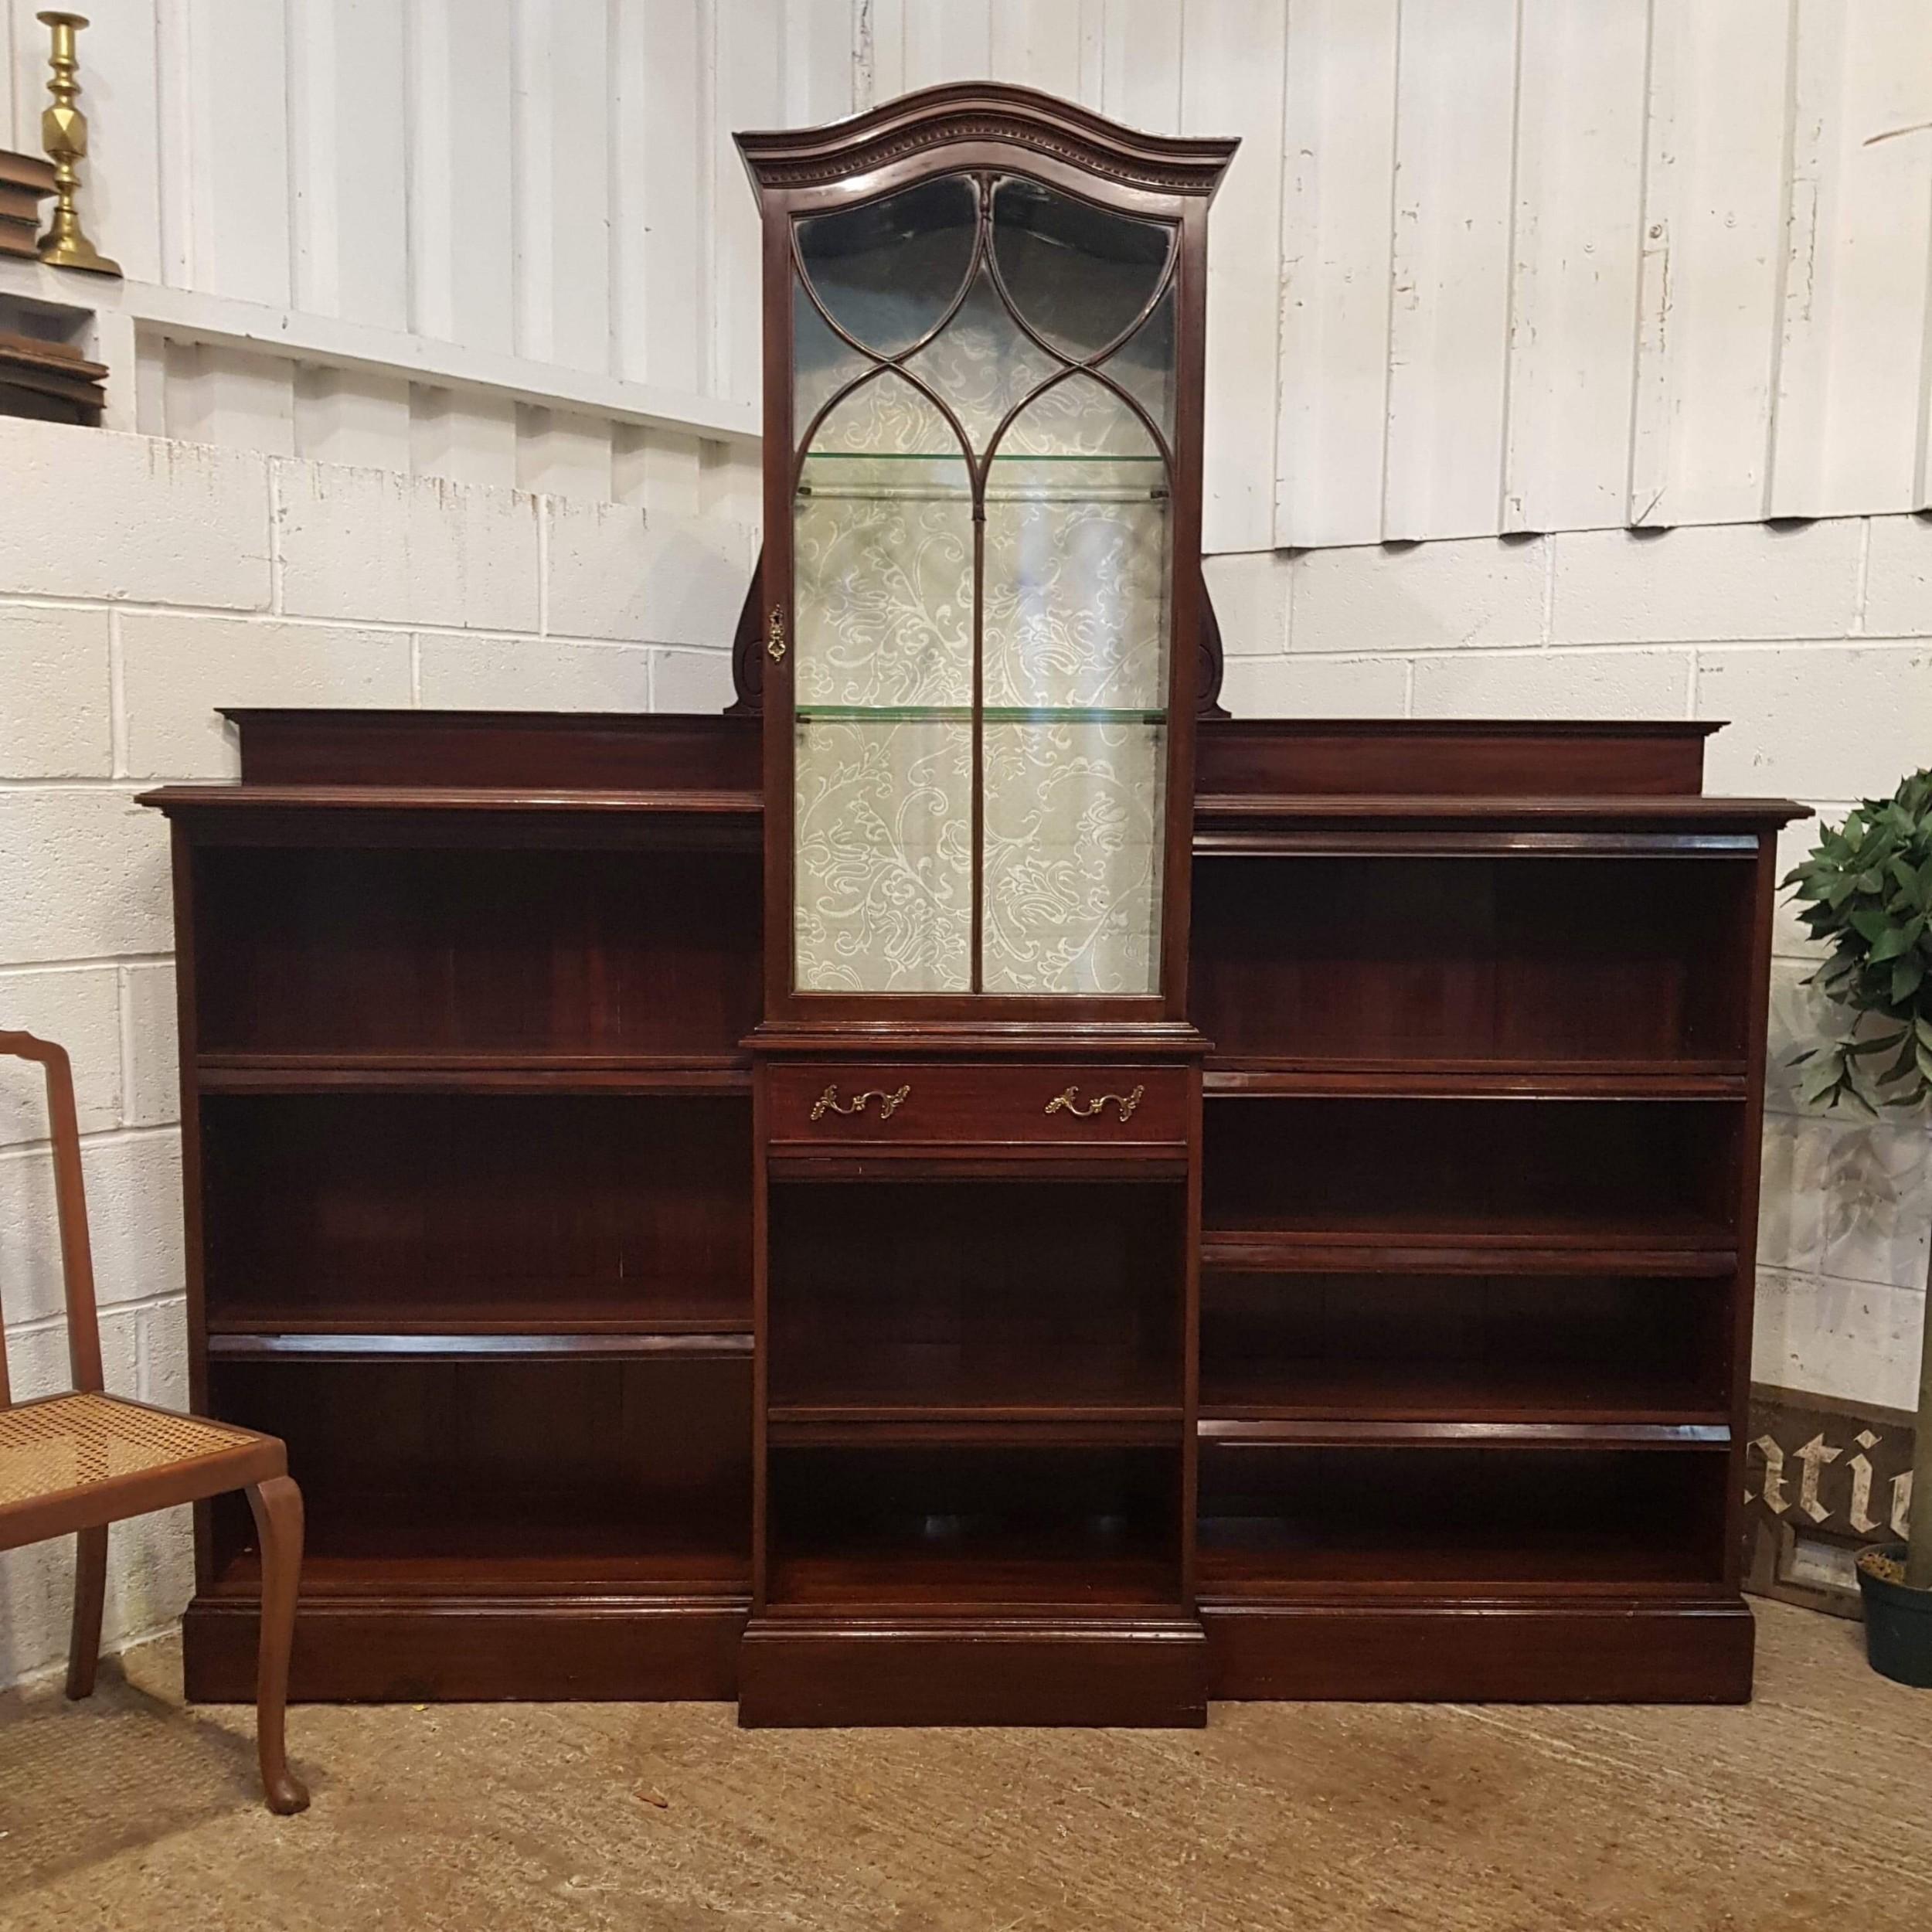 antique art nouveau mahogany astragal glazed cabinet with open bookcase c1890